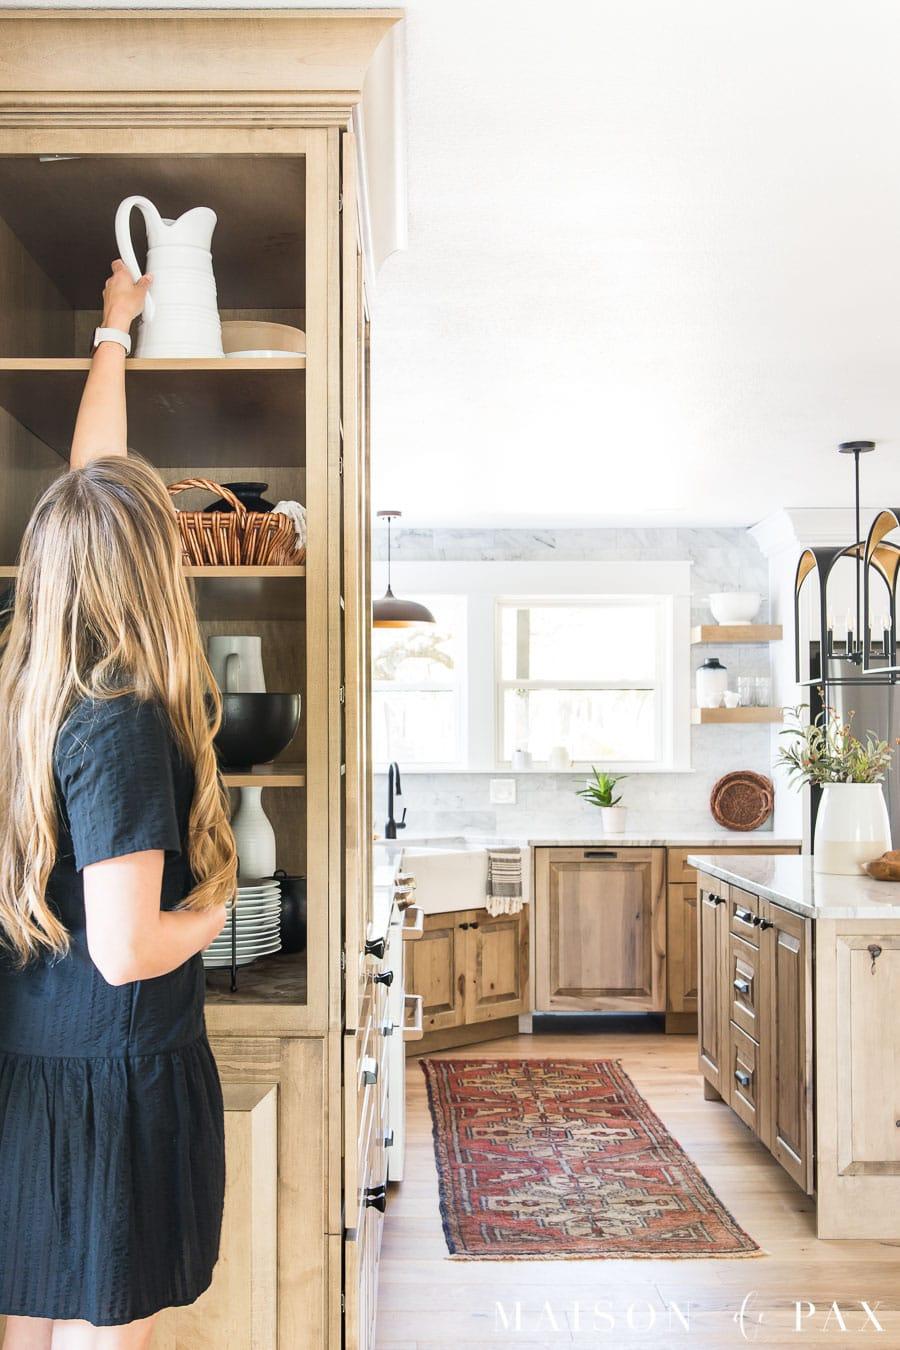 side access to deep decorative cabinet in kitchen - brilliant storage solution!